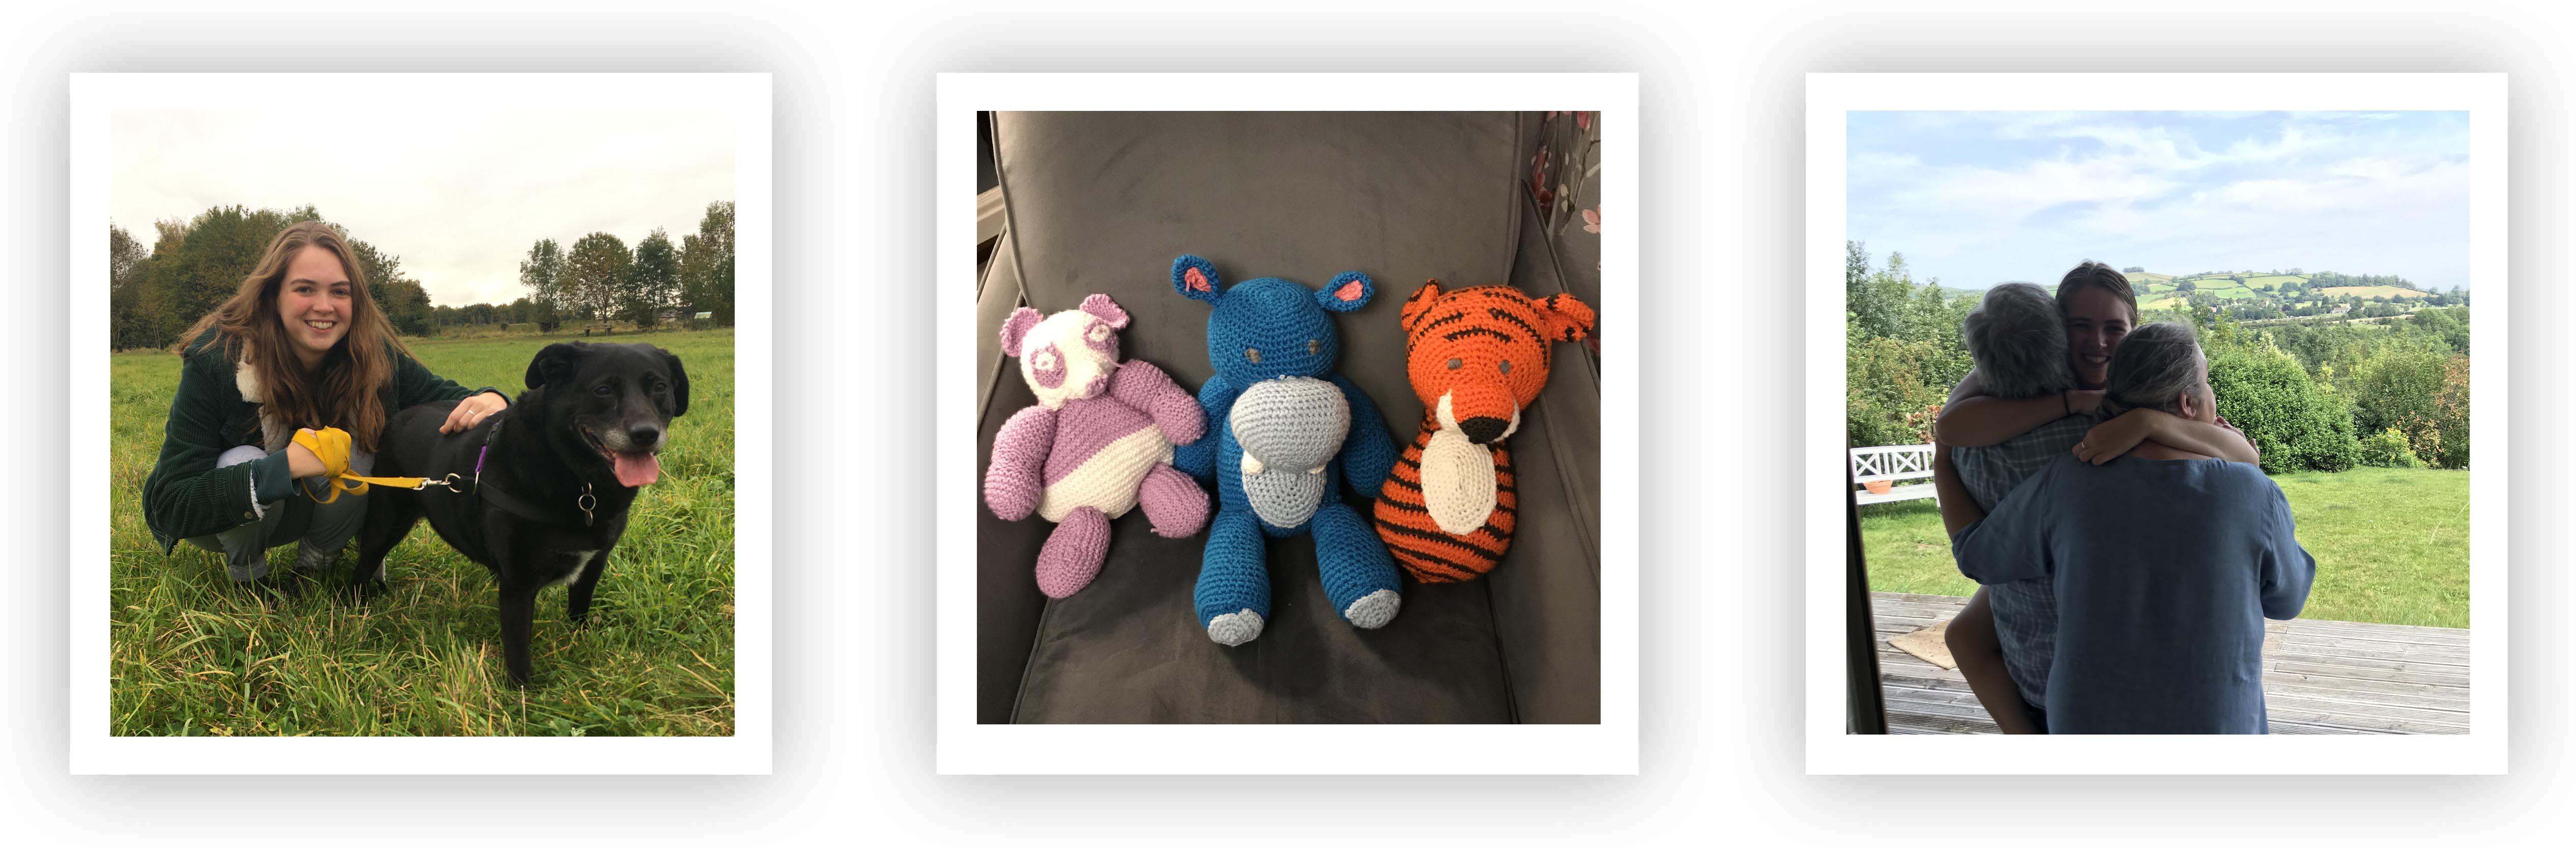 Rachel's teddybears